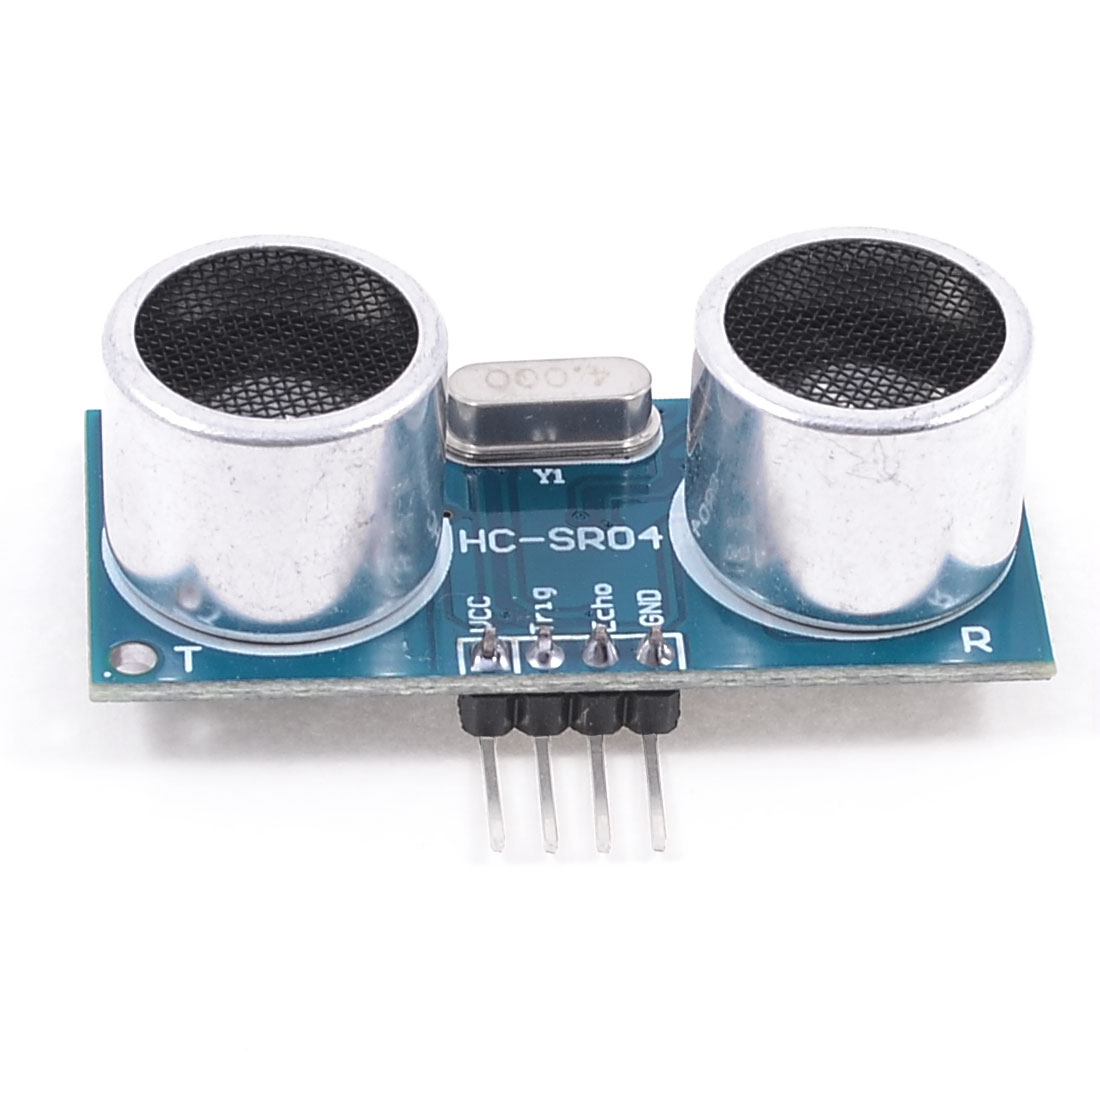 HC-SR04 Ultrasonic Module Distance Measurement Transducer Sensor DC 5V